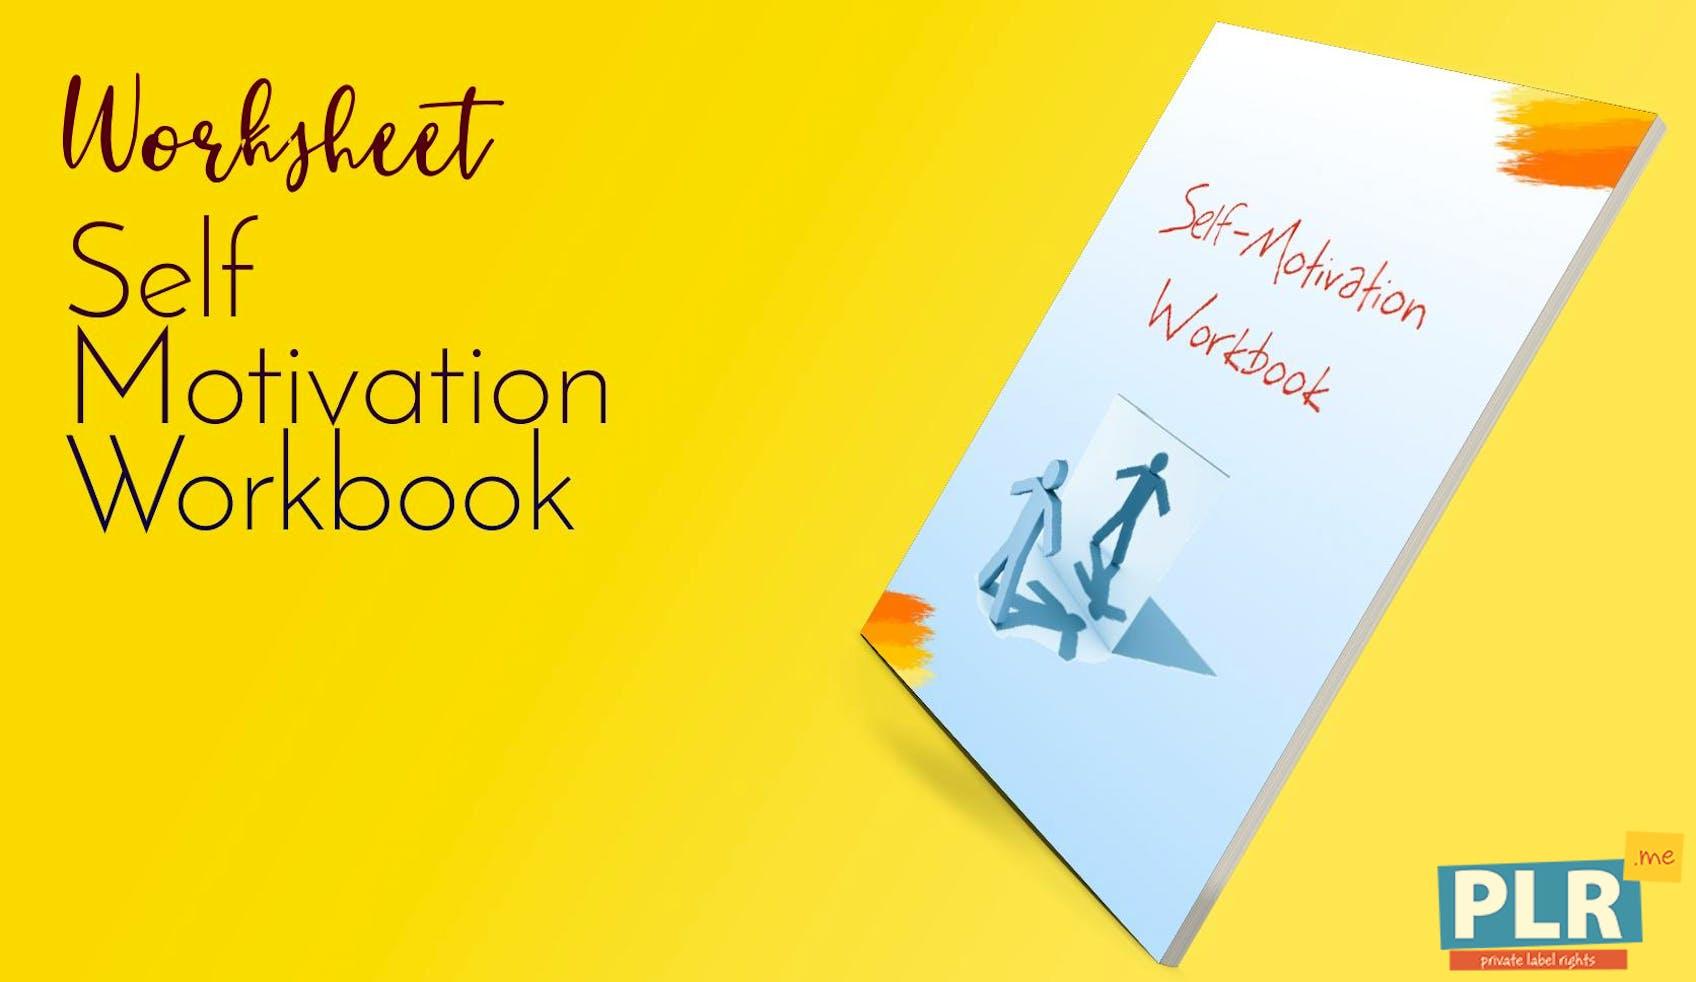 Self Motivation Workbook